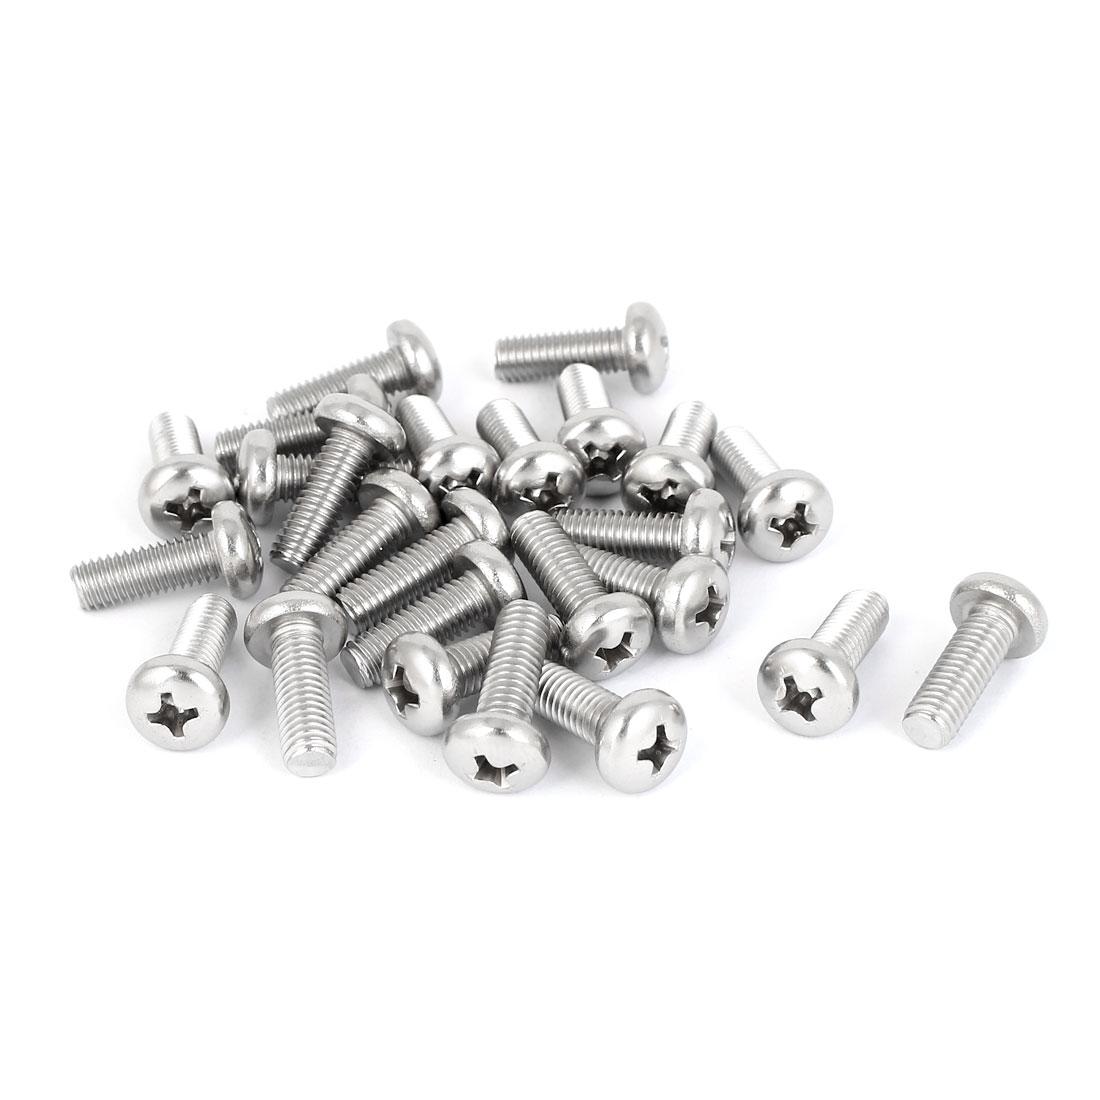 25 Pcs M5x14mm 316 Stainless Steel Phillips Pan Head Machine Screws Fasteners